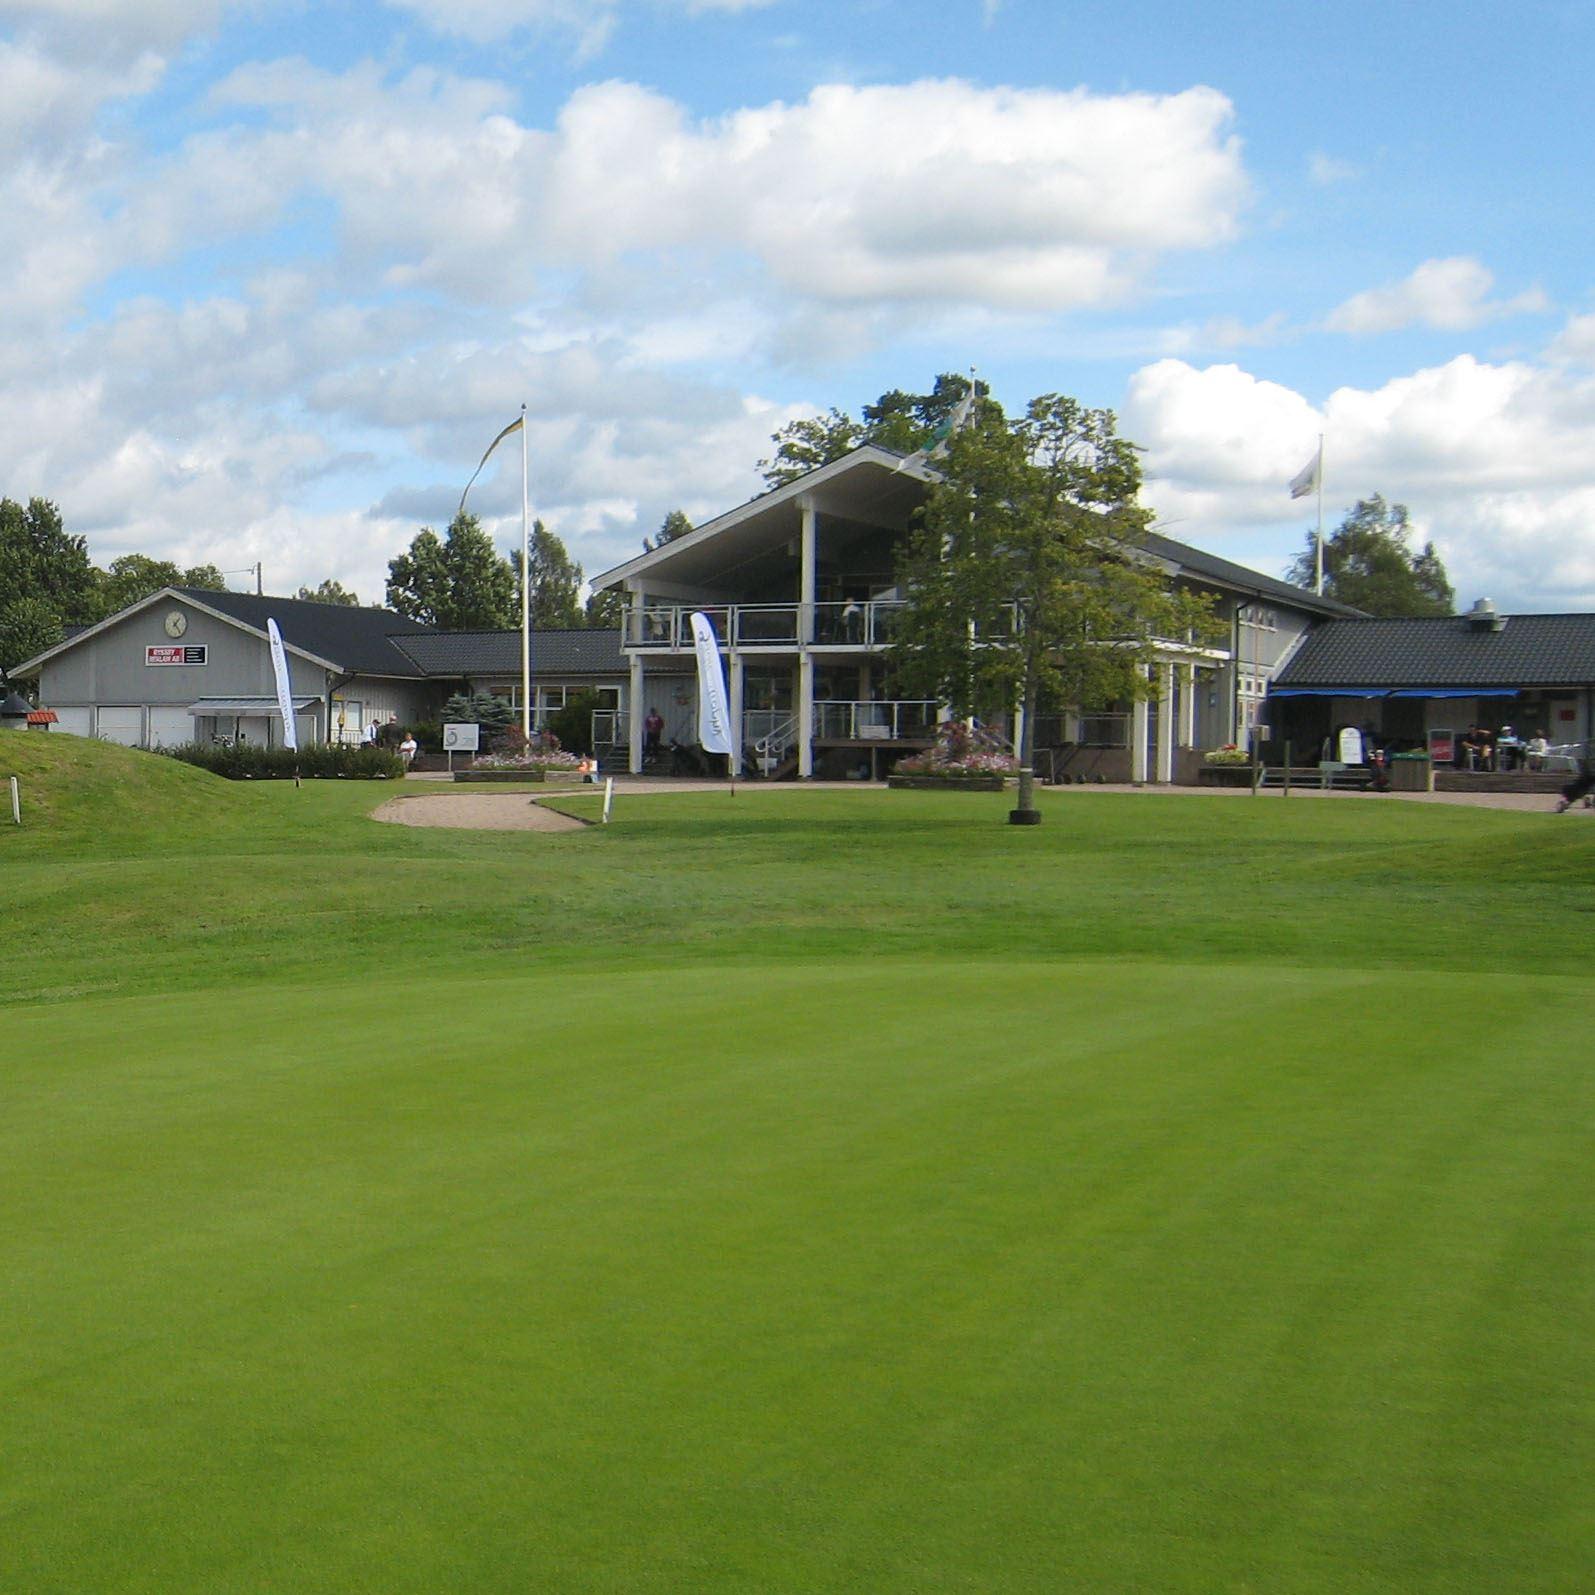 © Lagans GK, Lagans Golfclub & Golfplatz